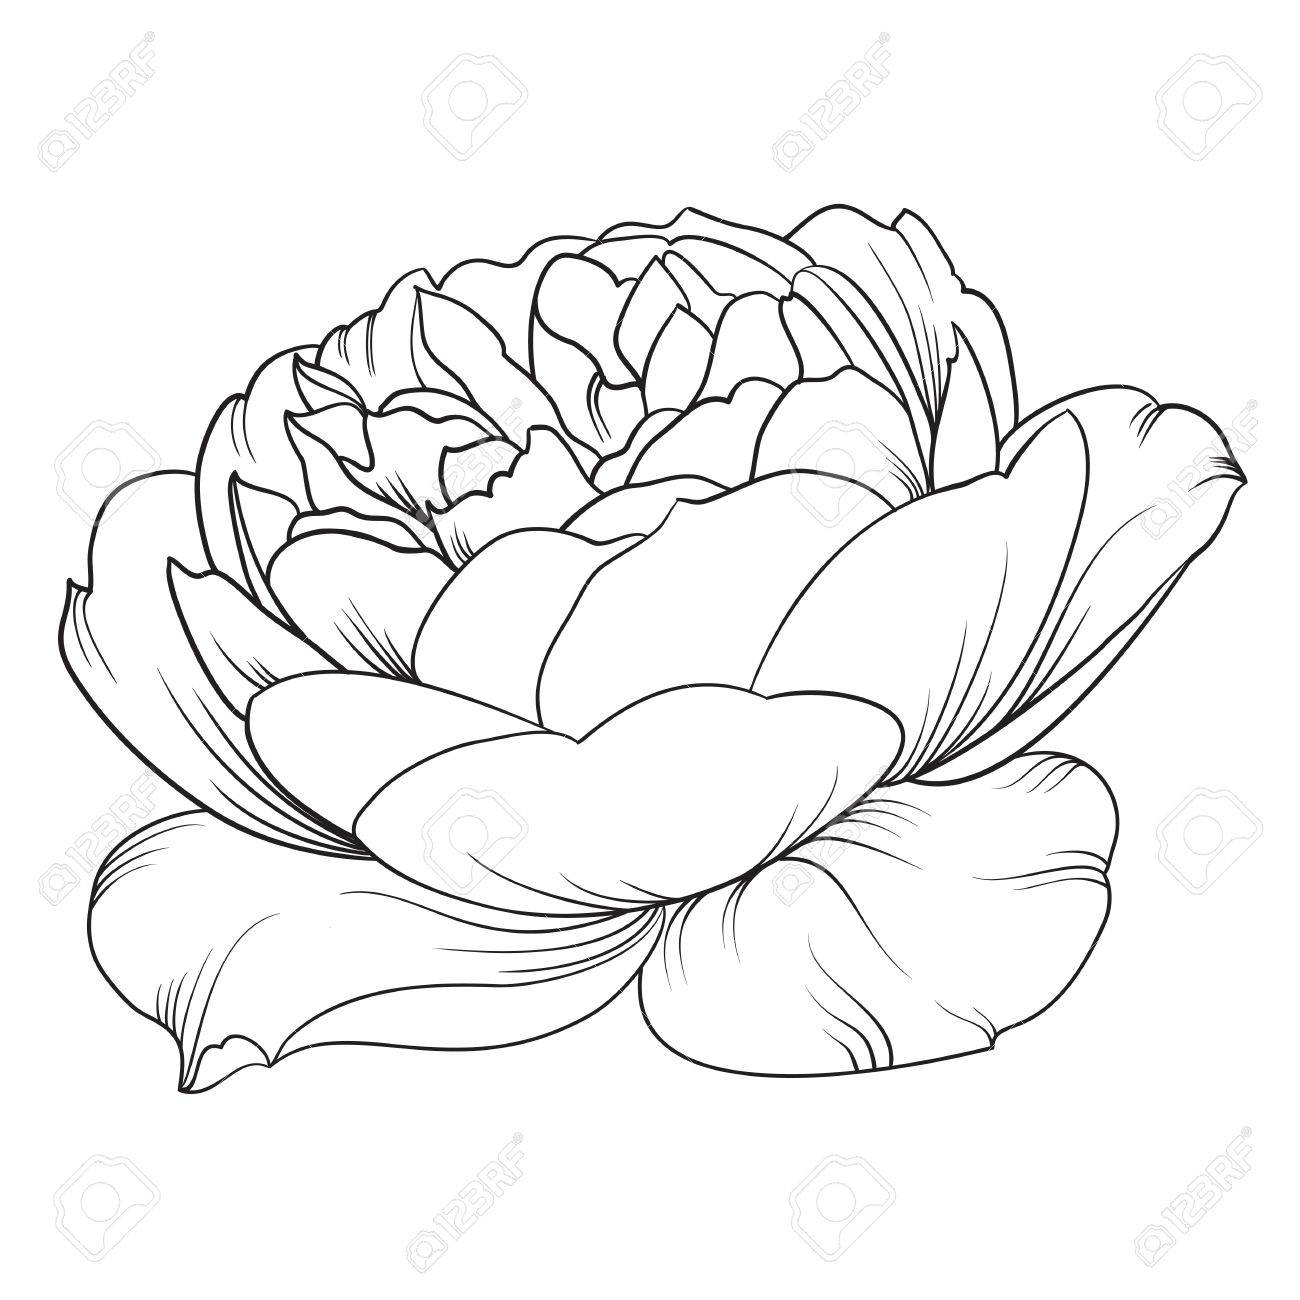 Silhouette Of Rose Rose Flower Botany Set Black And White